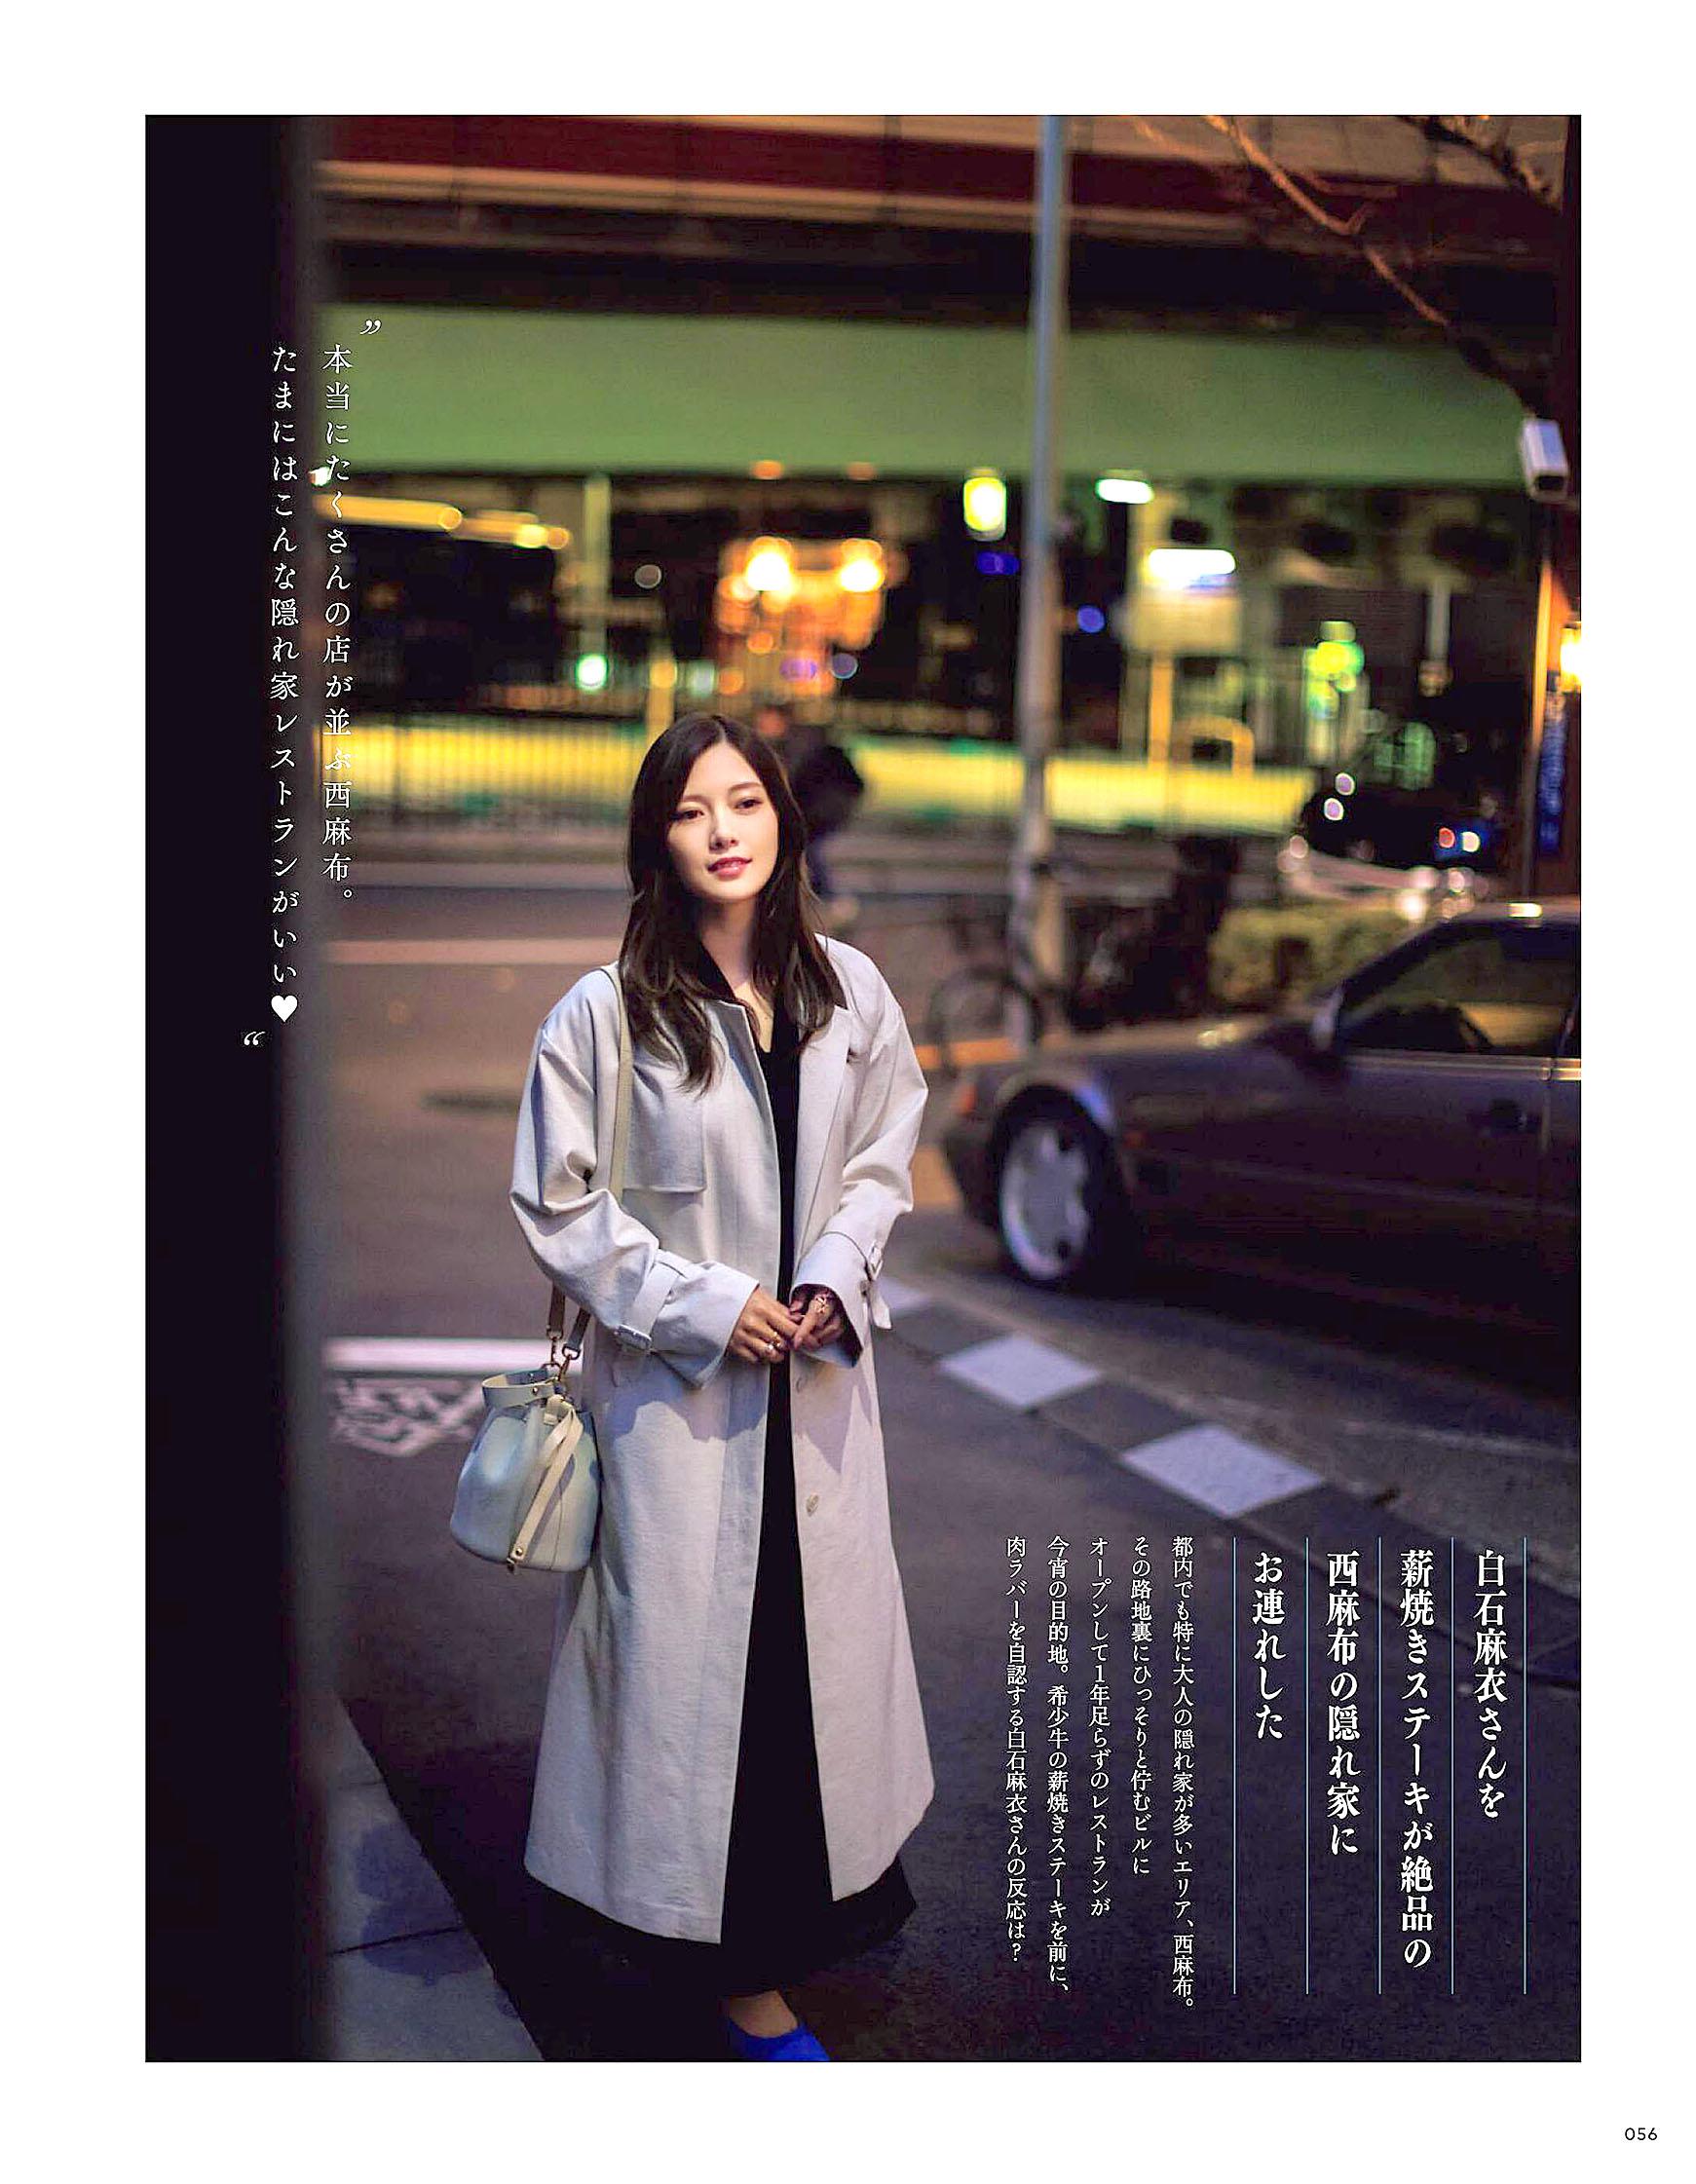 MShiraishi Tokyo Calendar 2020-04 03.jpg